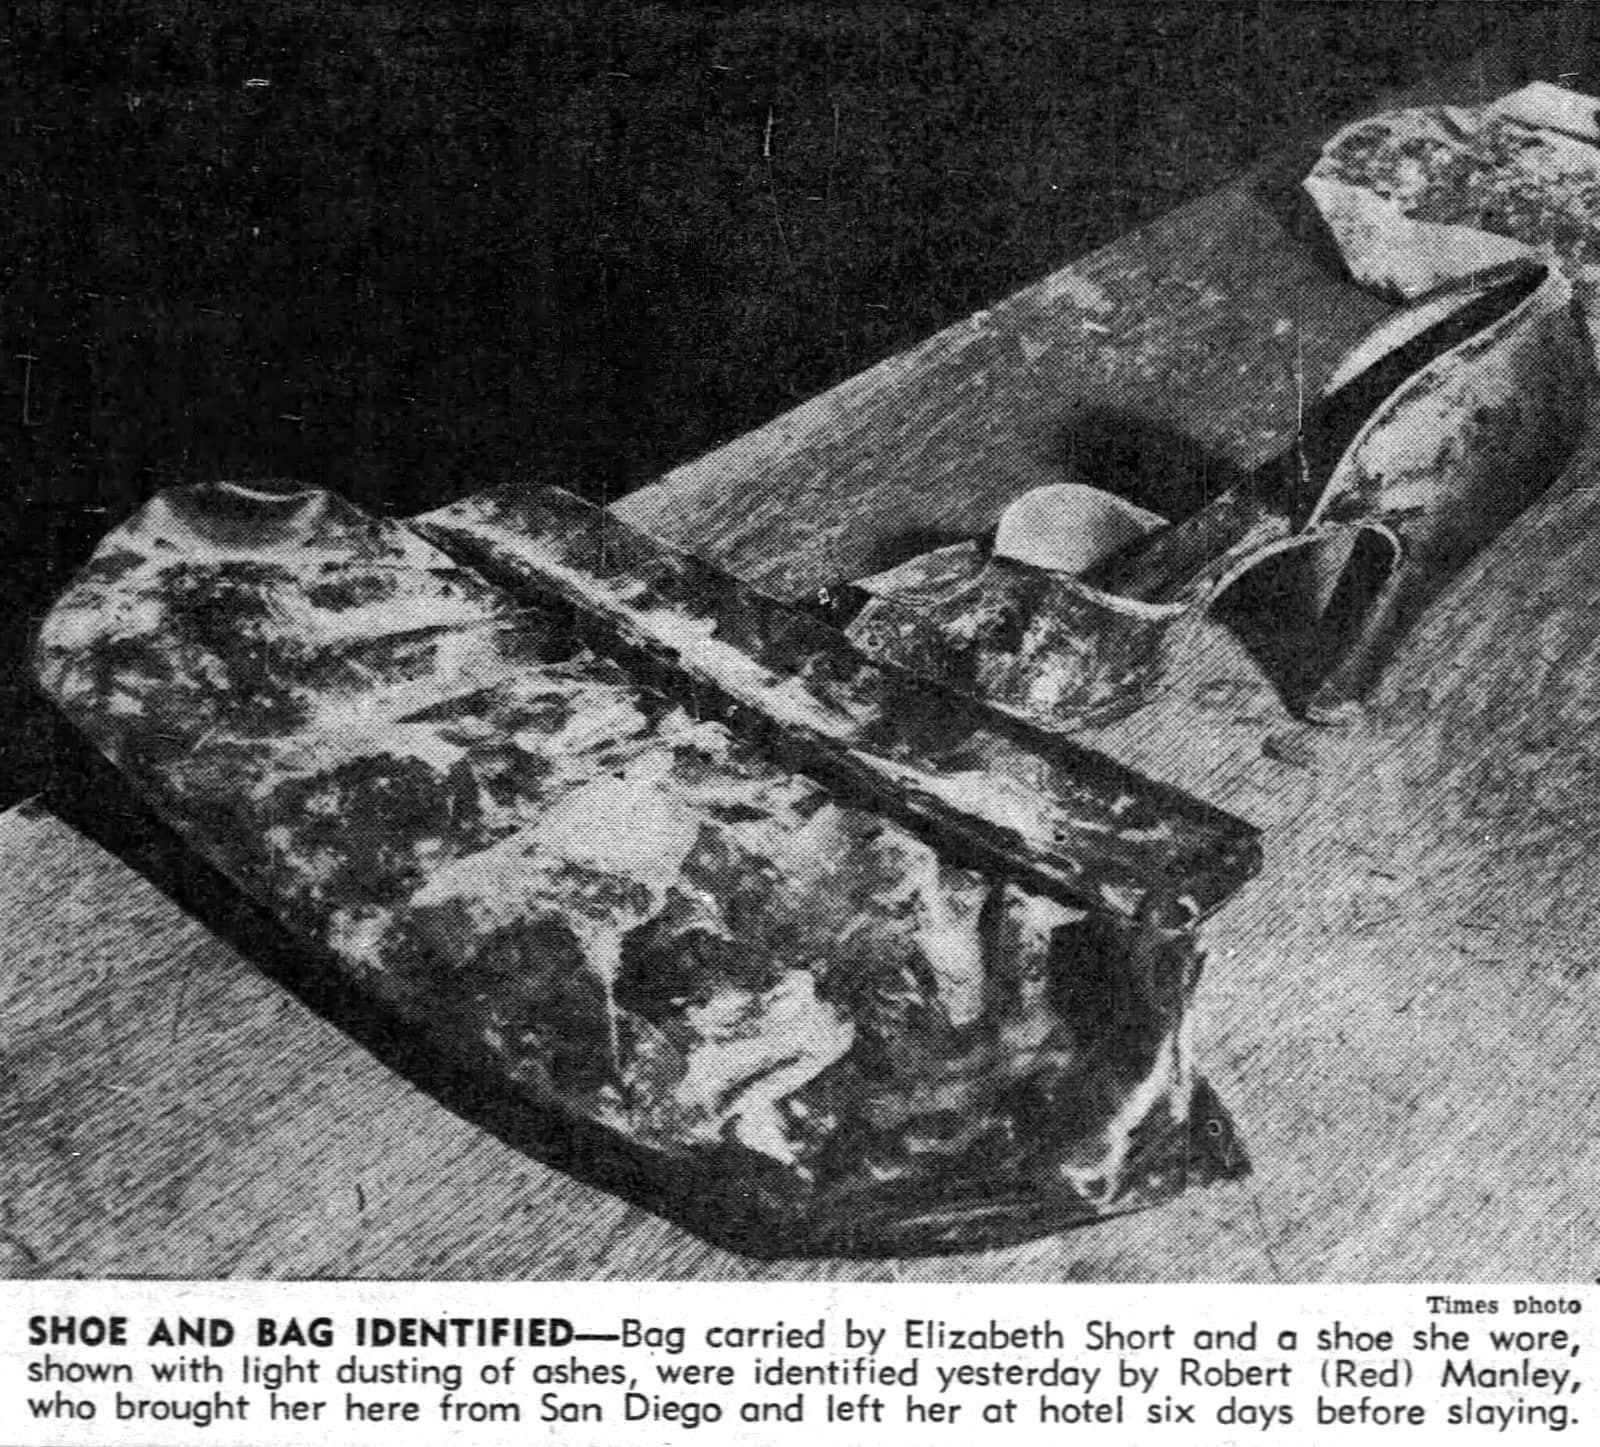 Elizabeth Short murder victim - Purse and shoe